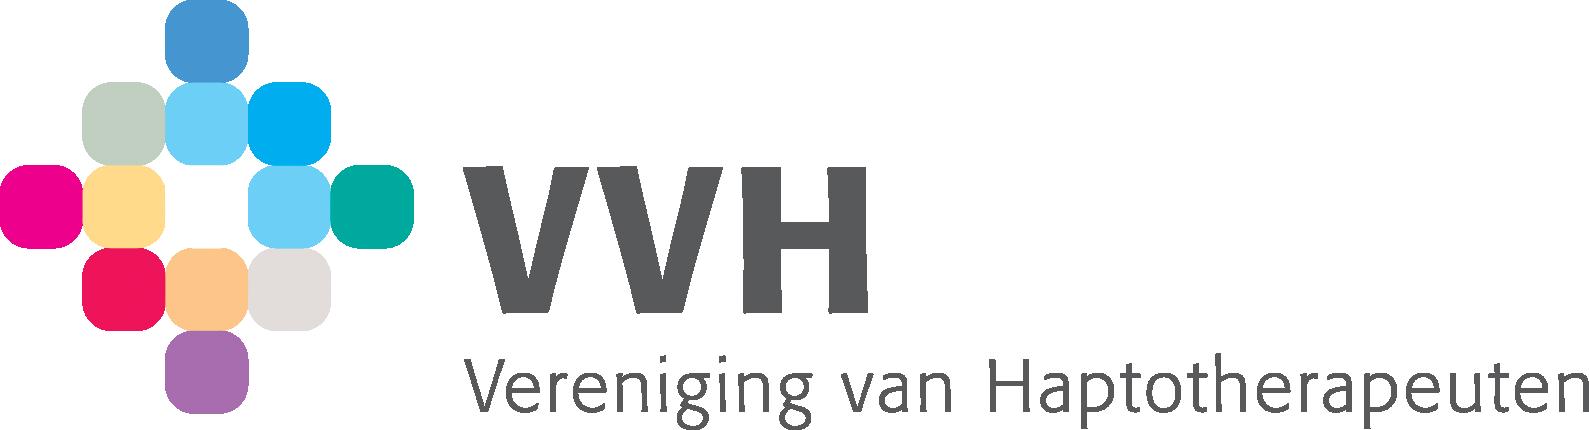 VVH_logo-rgb